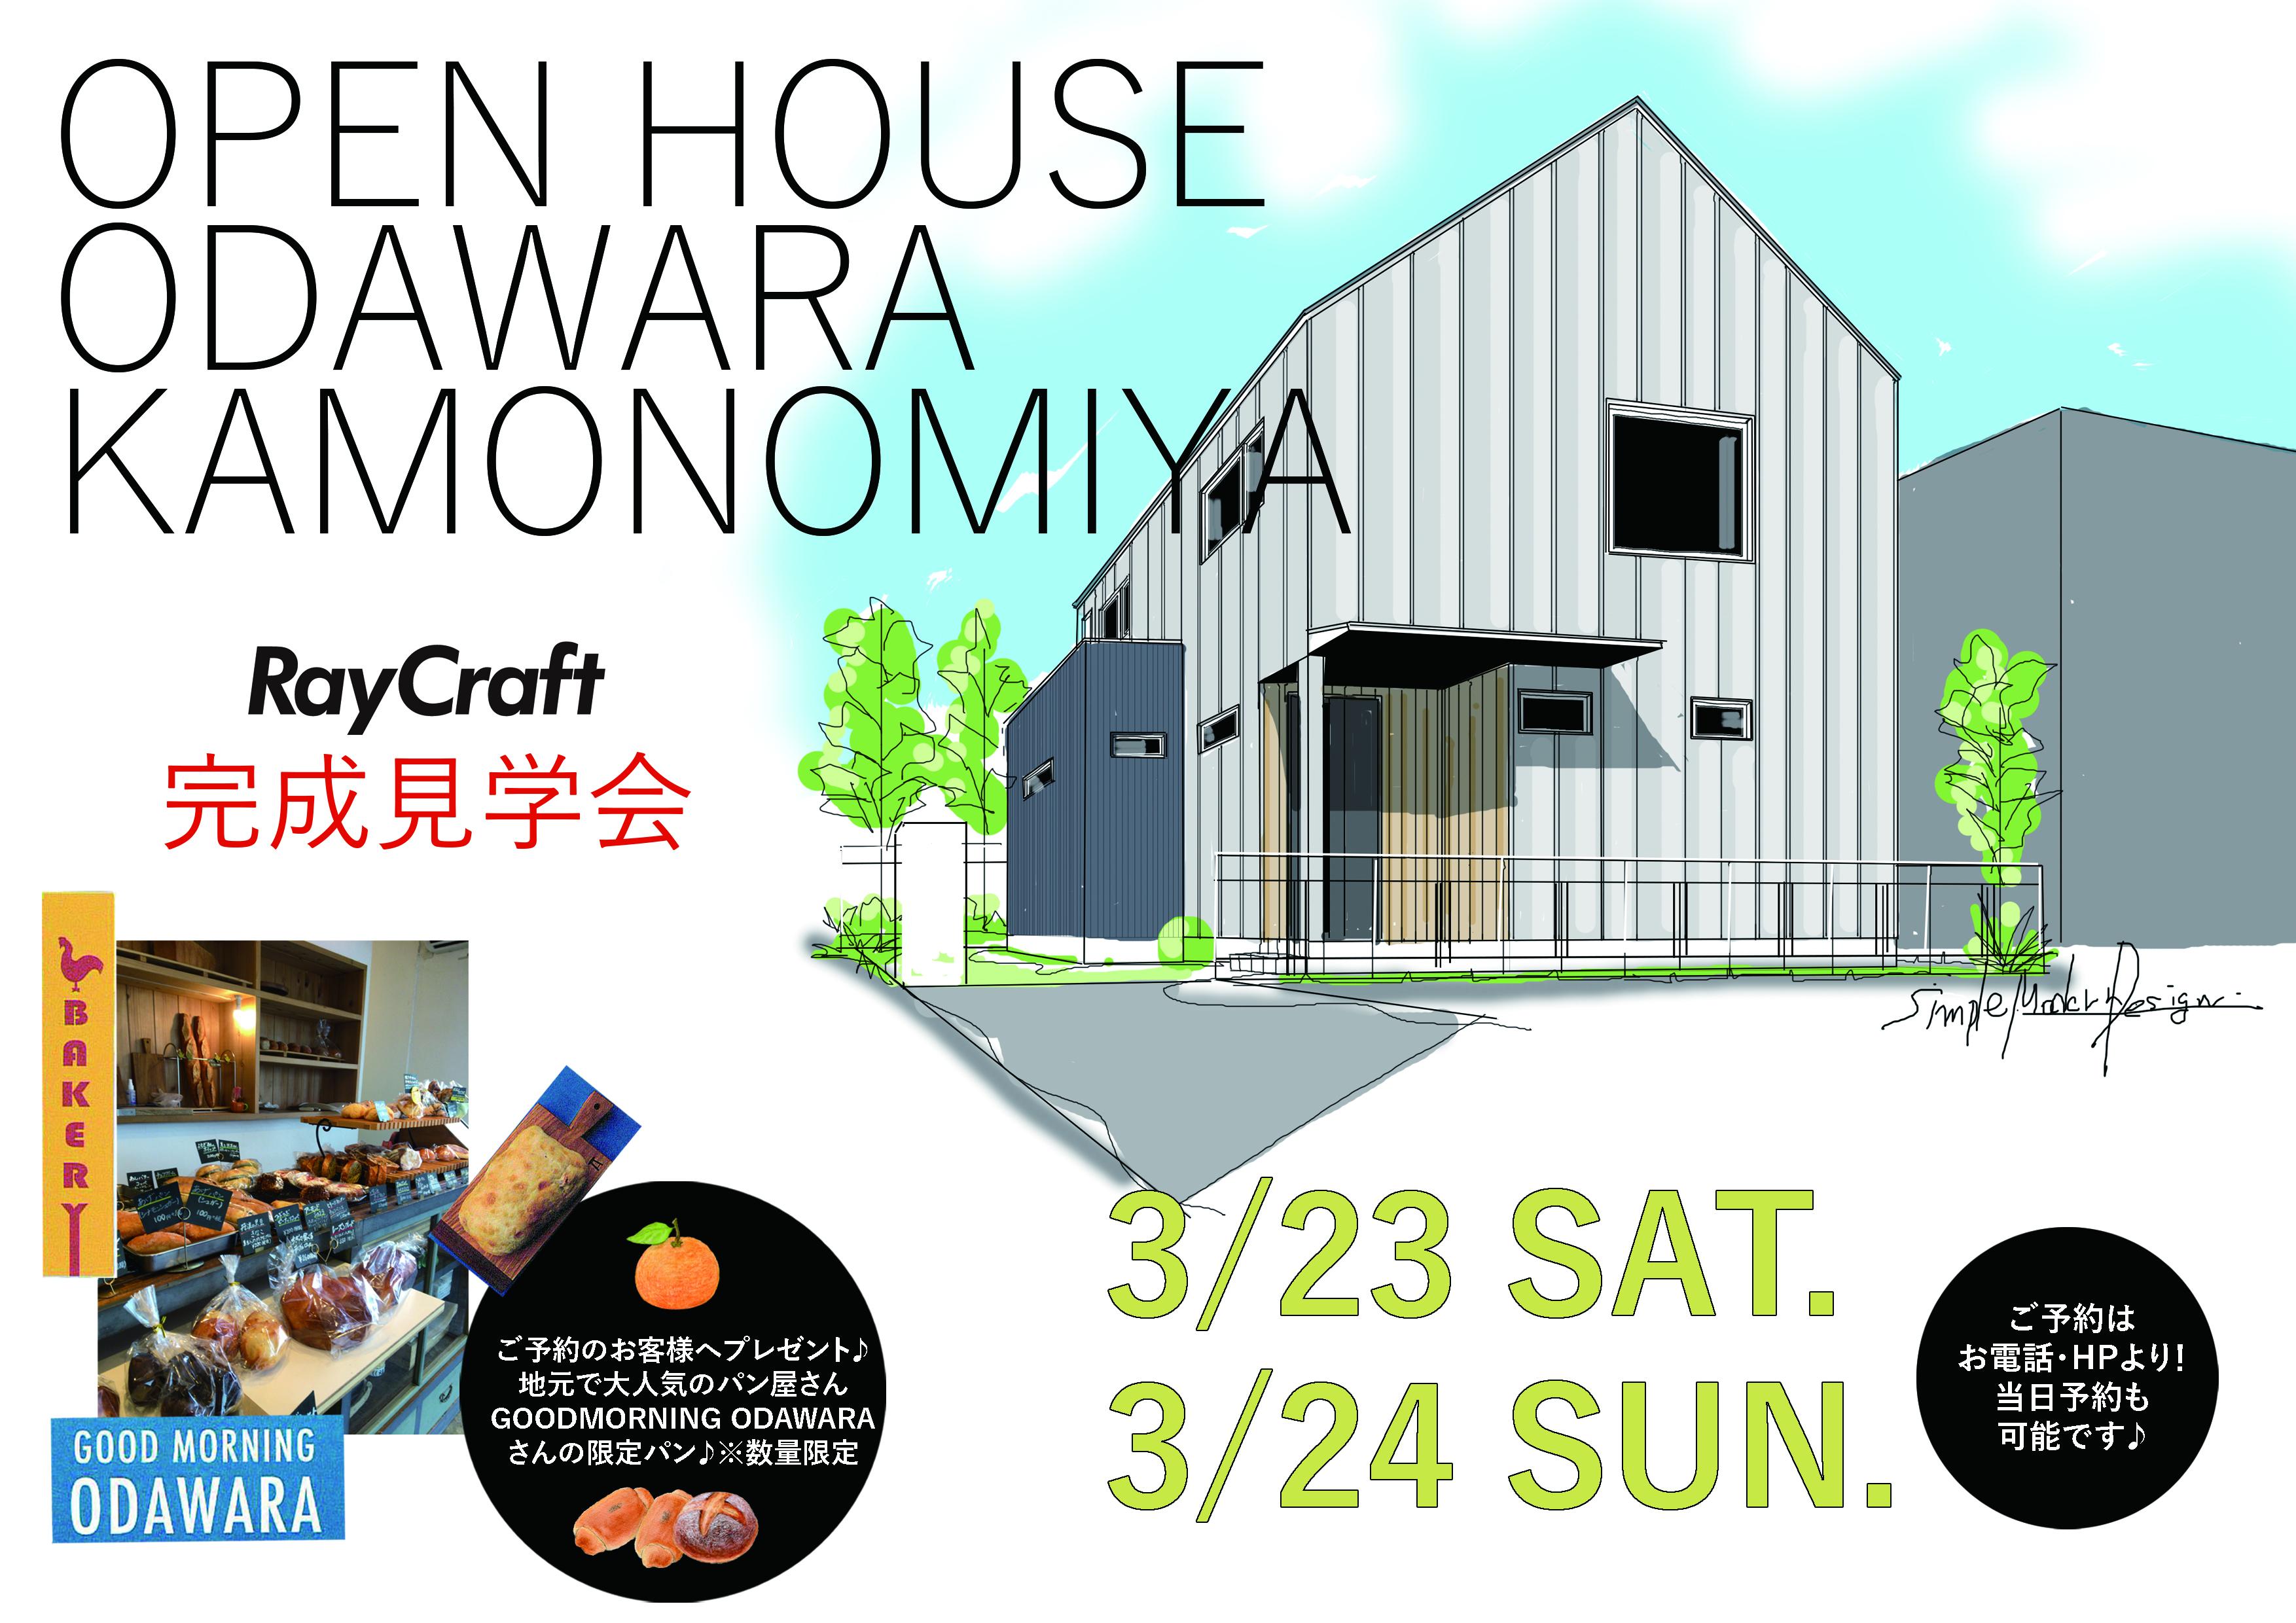 2019年3月23日(土)・24日(日) OPENHOUSE @ODAWARA